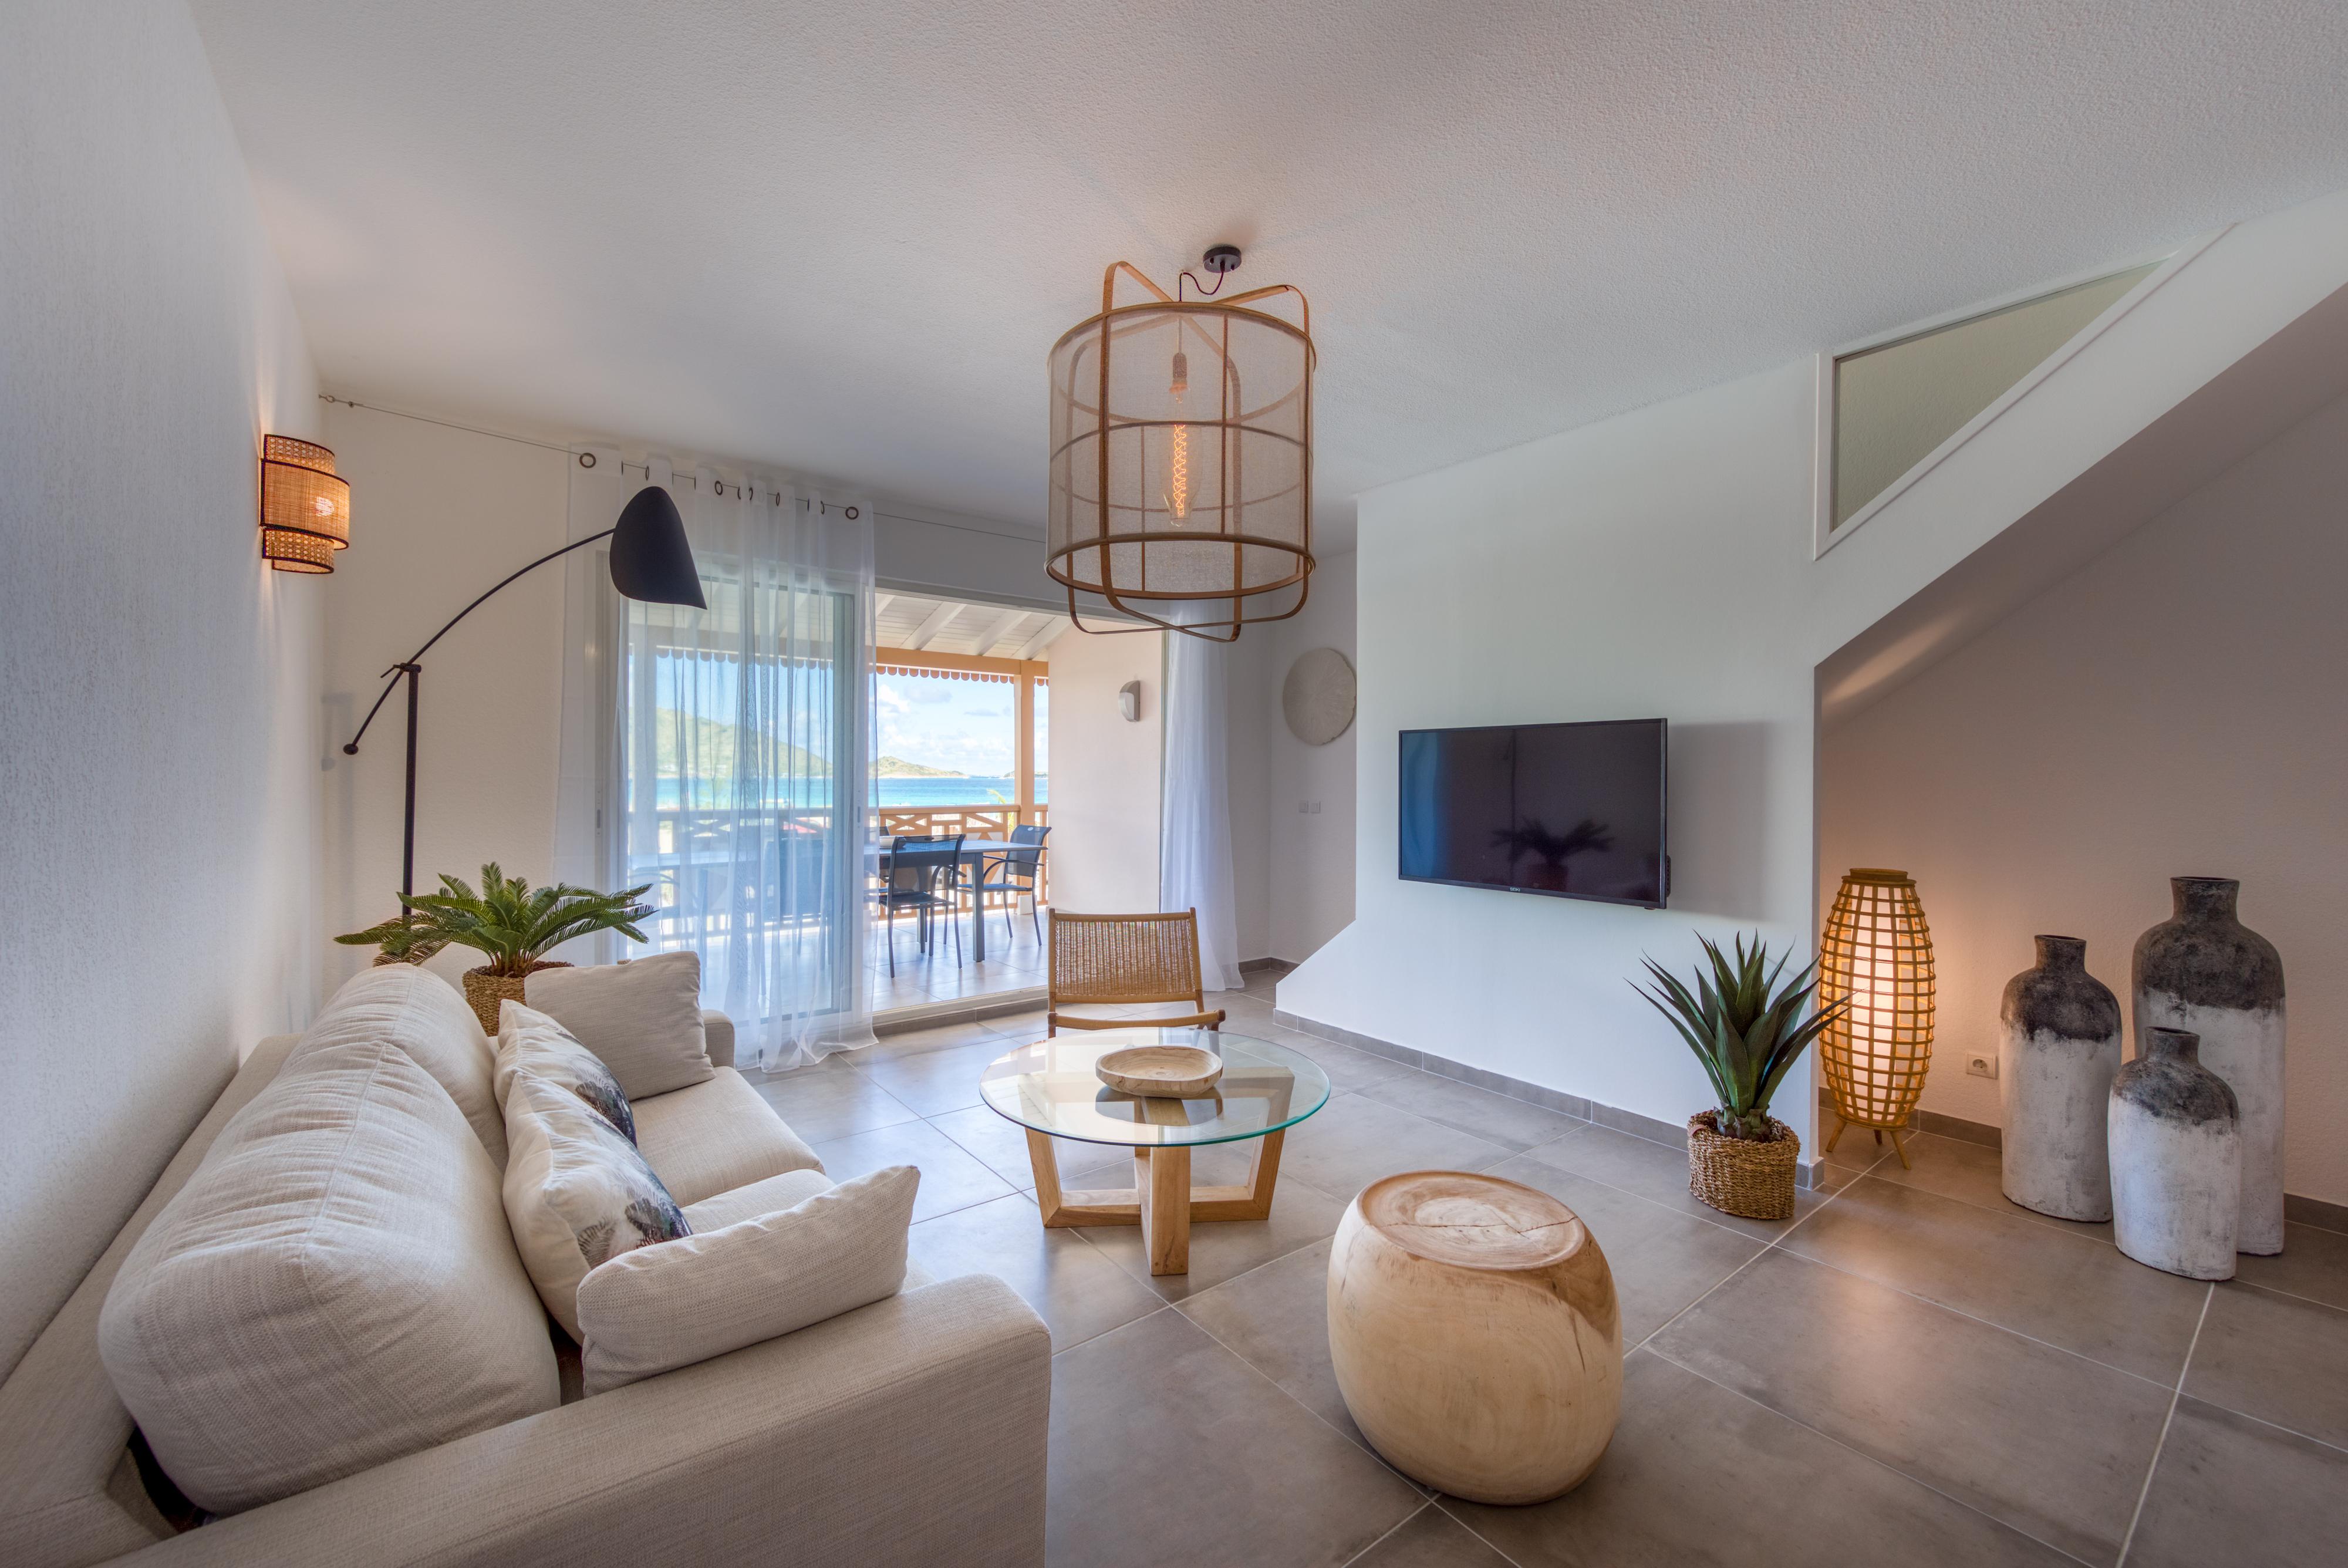 Luxurious 3 bedroom Duplex on Orient Bay beach